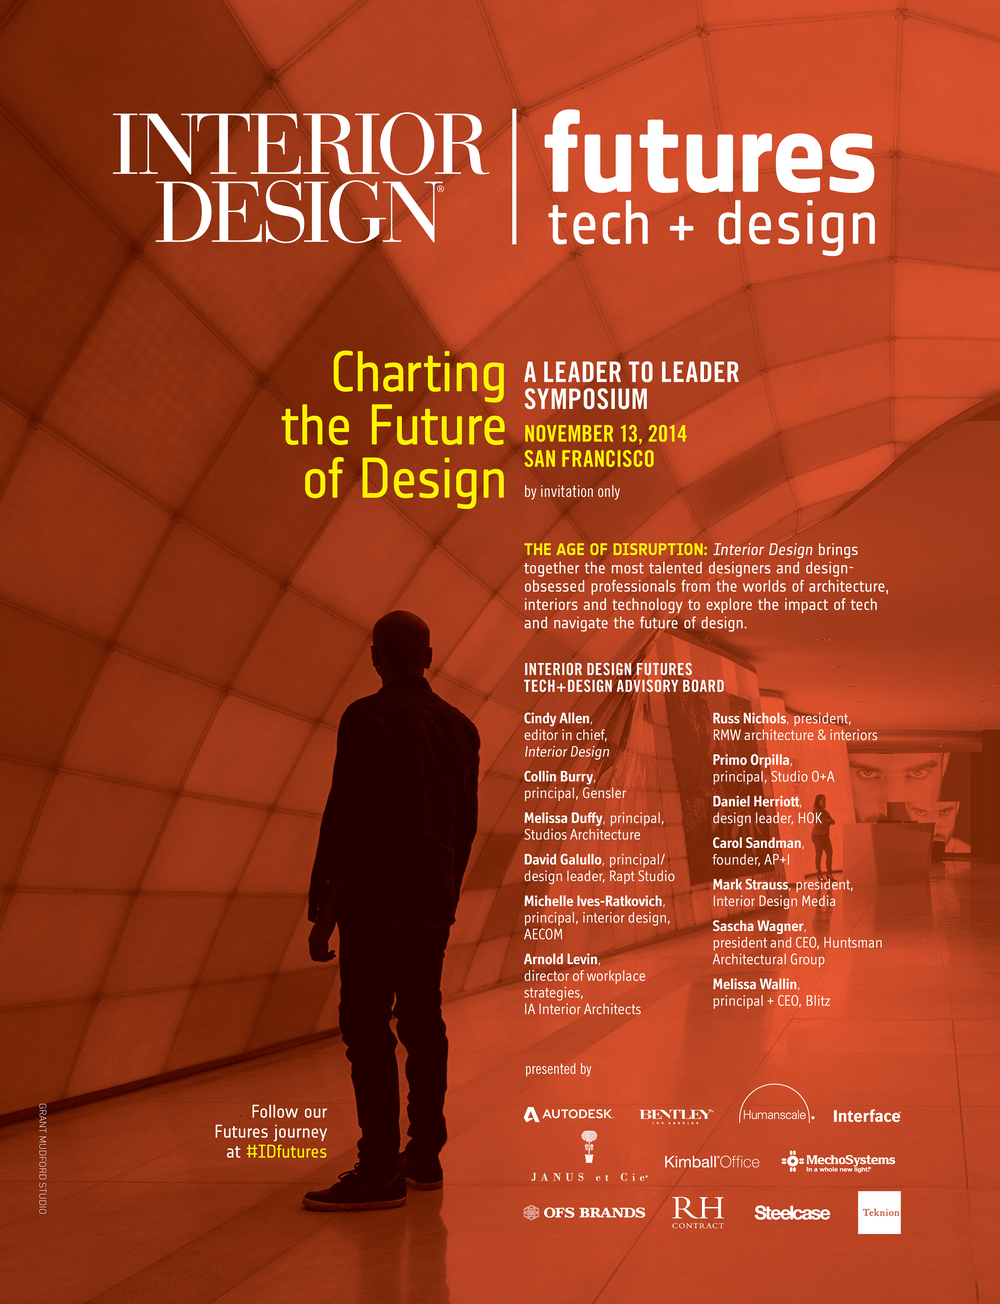 Interior Design Futures tech design CHANDRA HIRA